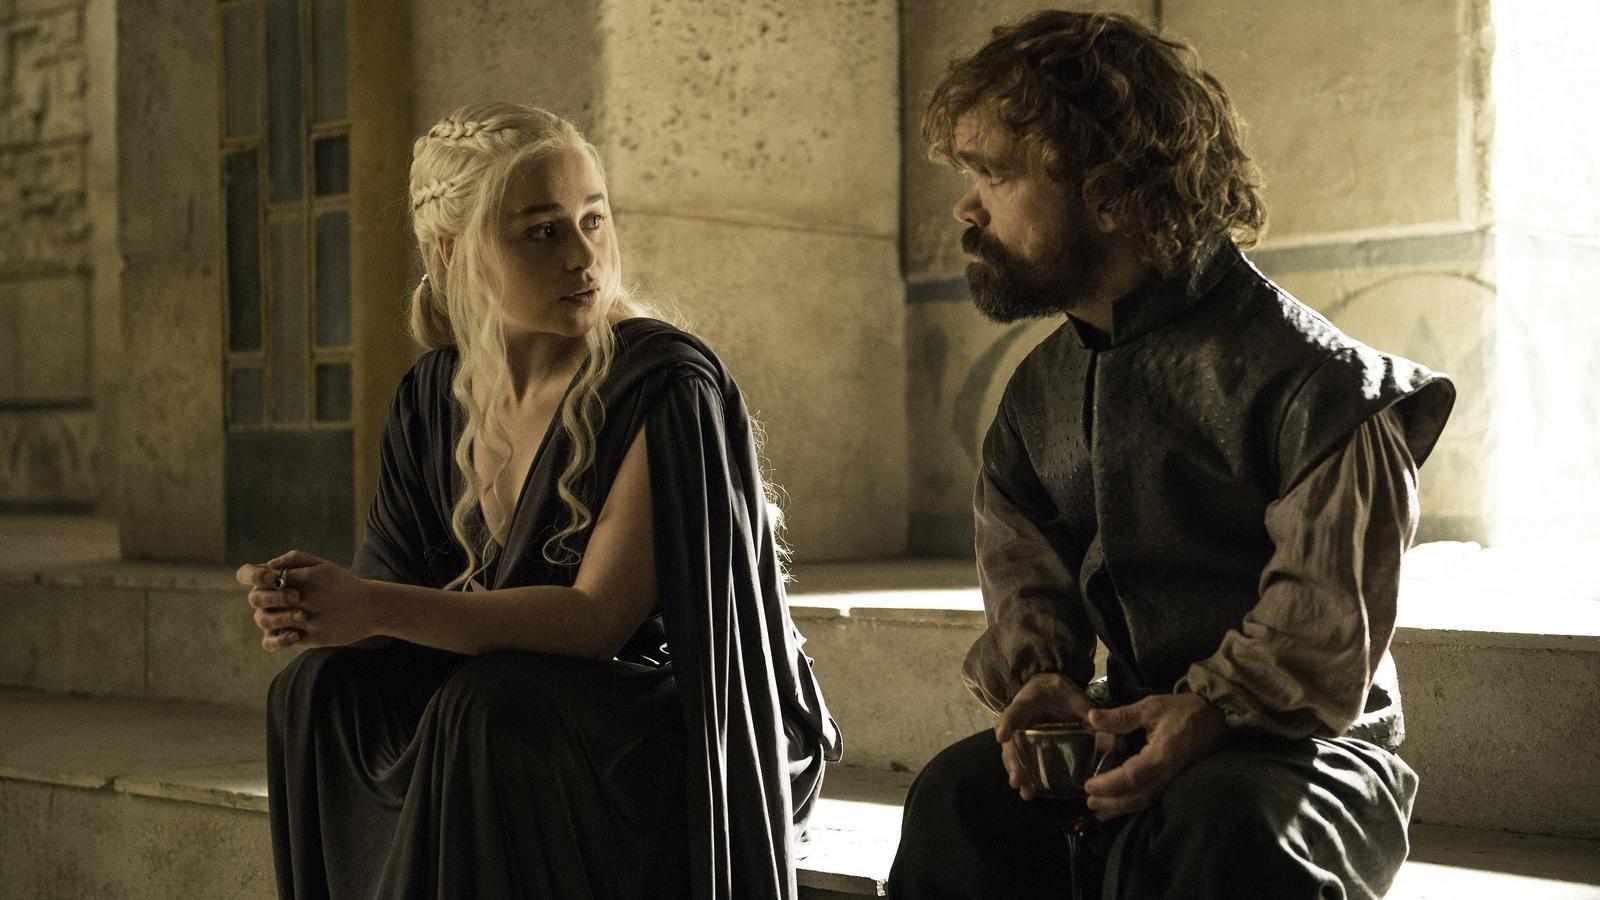 Daenerys Targaryen i Tyrion Lannister al darrer capítol de la temporada